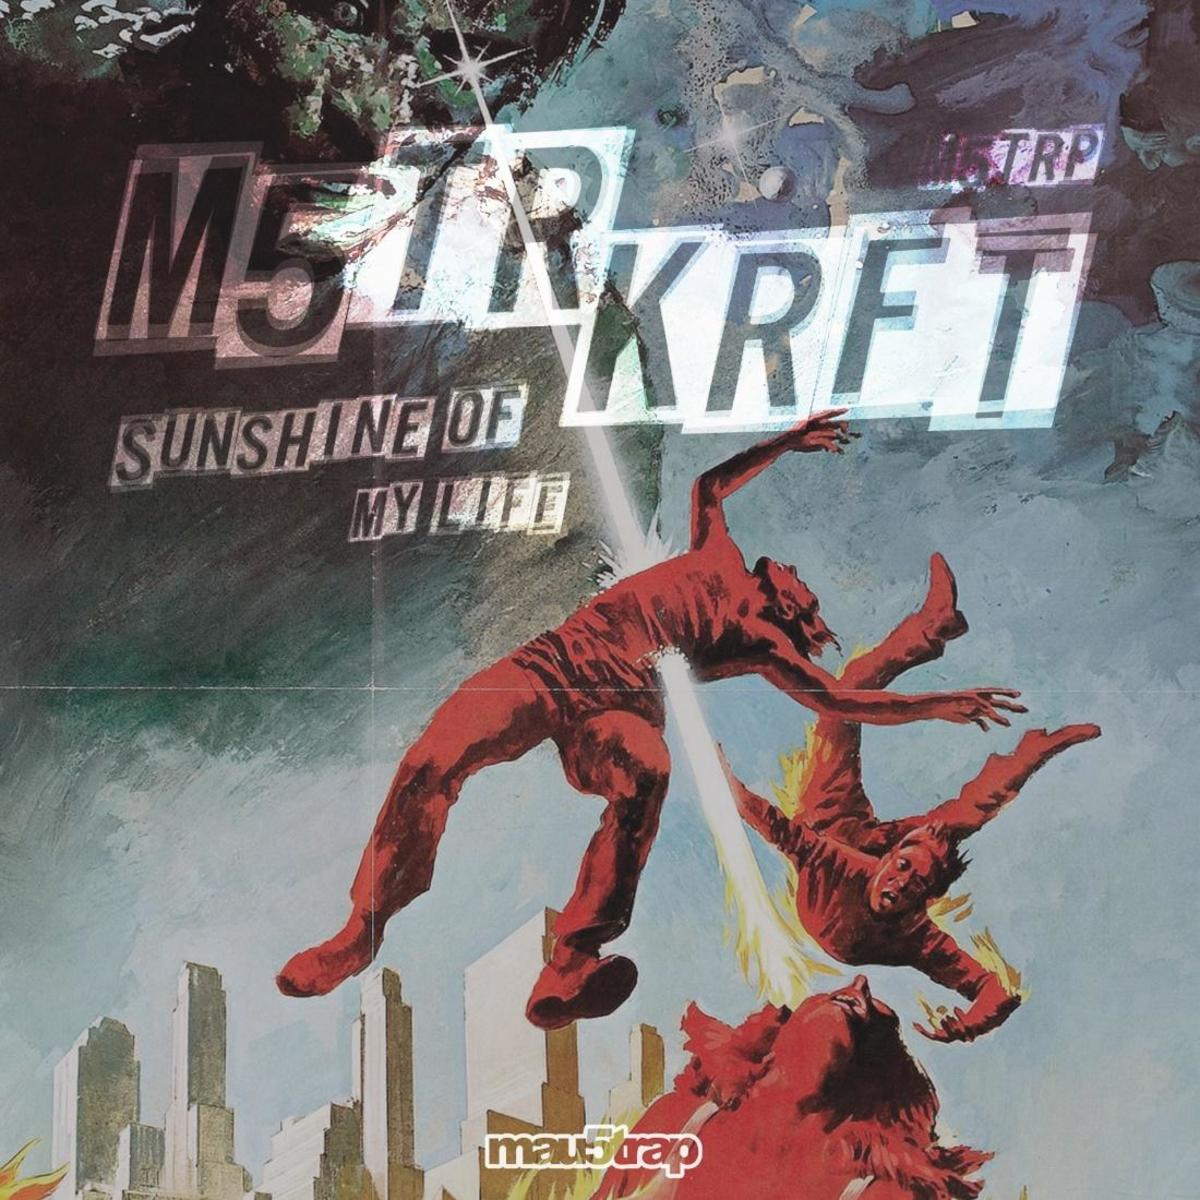 MSRTKRFT Sunshine Of My Life EP